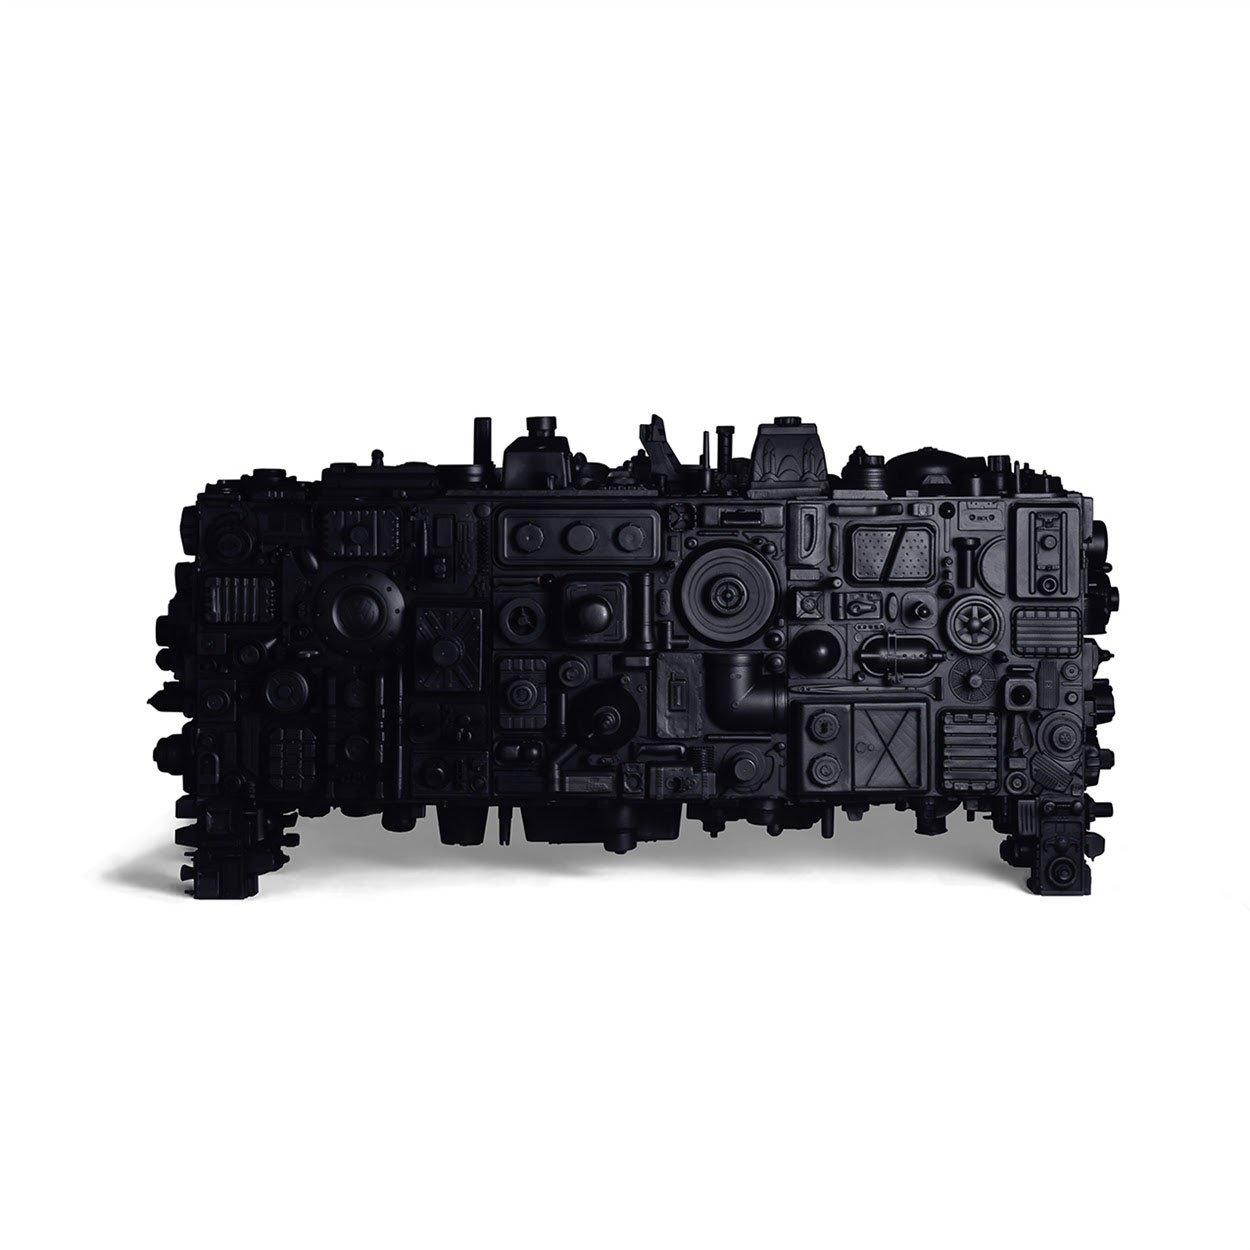 Stuart Haygarth,Barnacle(Black), 2009. Black polyester resin, steel, painted MDF. Photo courtesy Carpenters Workshop Gallery.